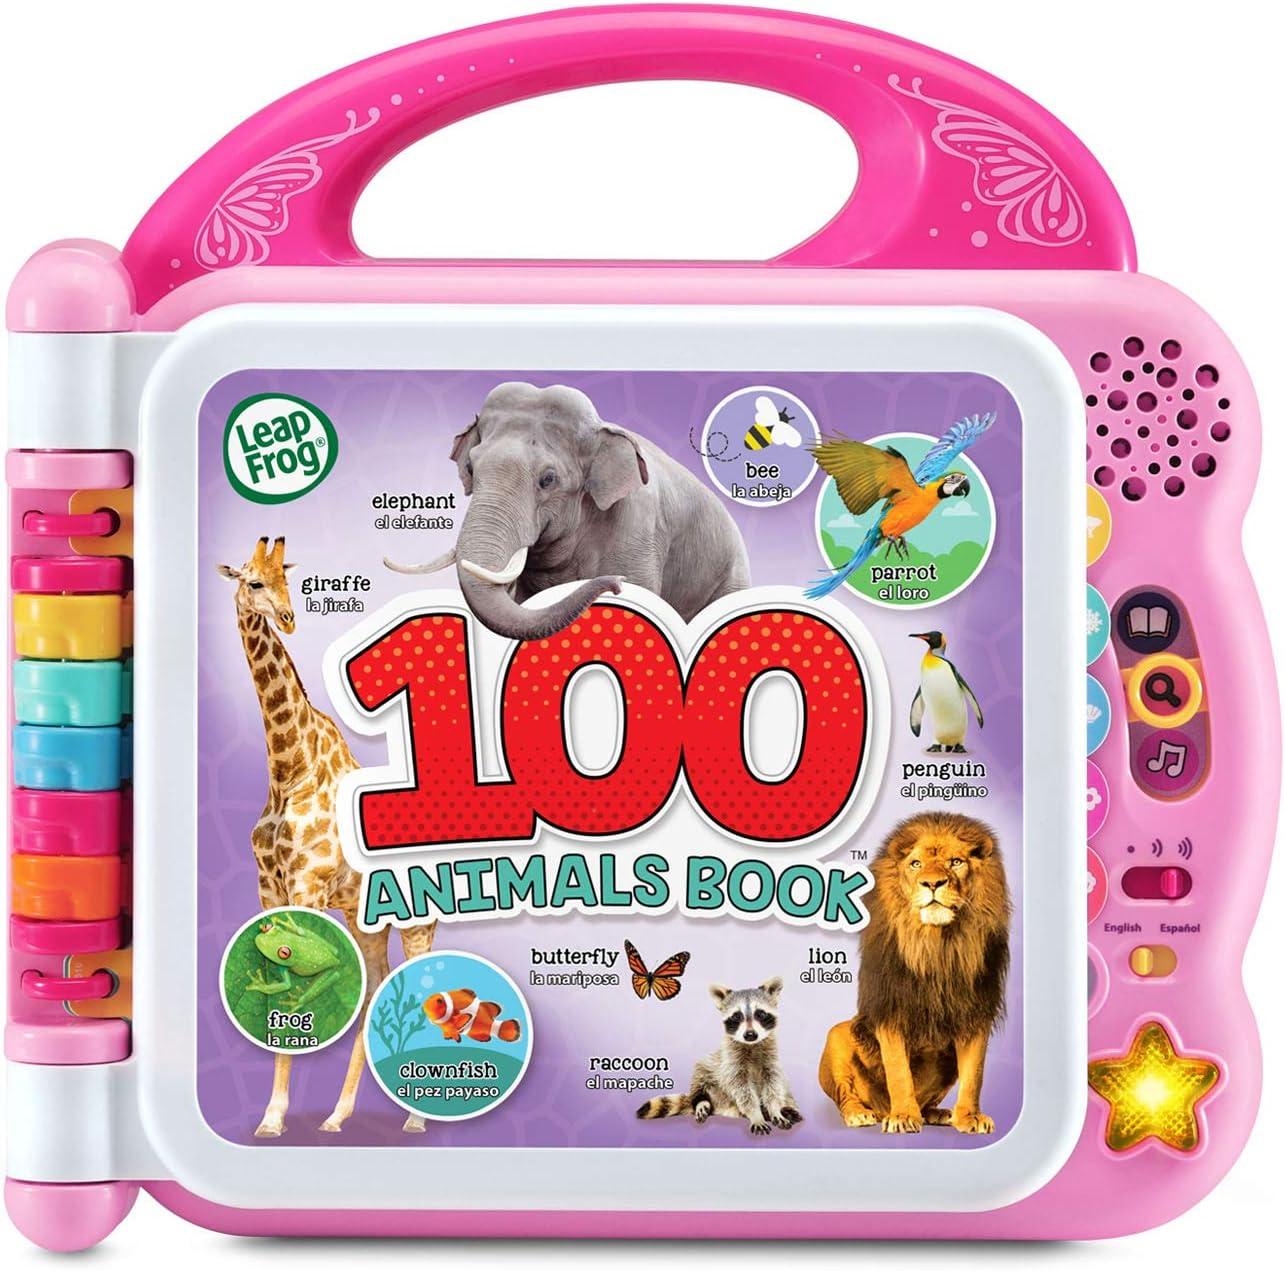 LeapFrog: 100 Animals Book! .99 (REG .00) at Woot!